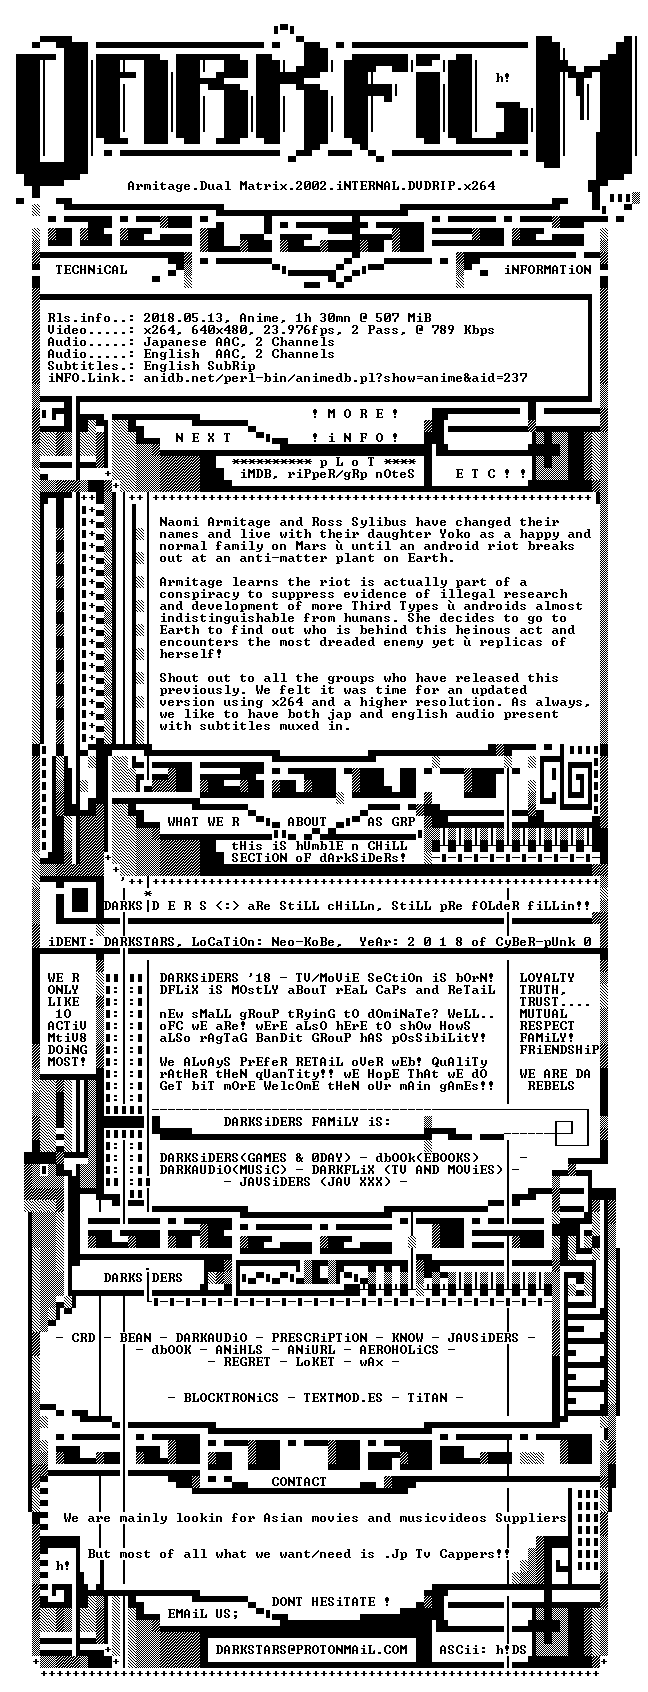 Armitage Dual-Matrix 2002 iNTERNAL DVDRIP x264-DARKFLiX